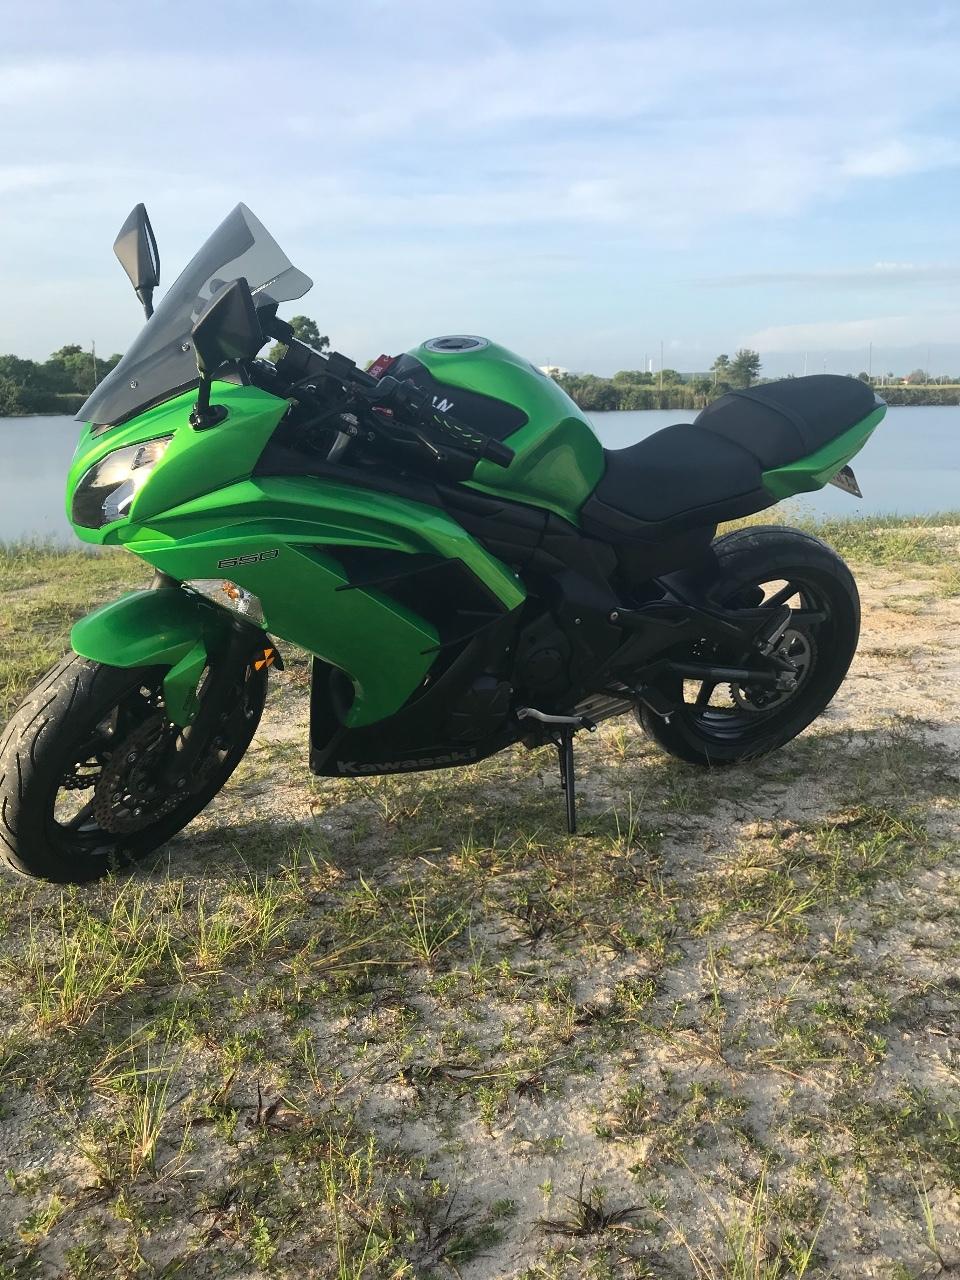 ZX10R For Sale - Kawasaki Motorcycle,528553,1049211046